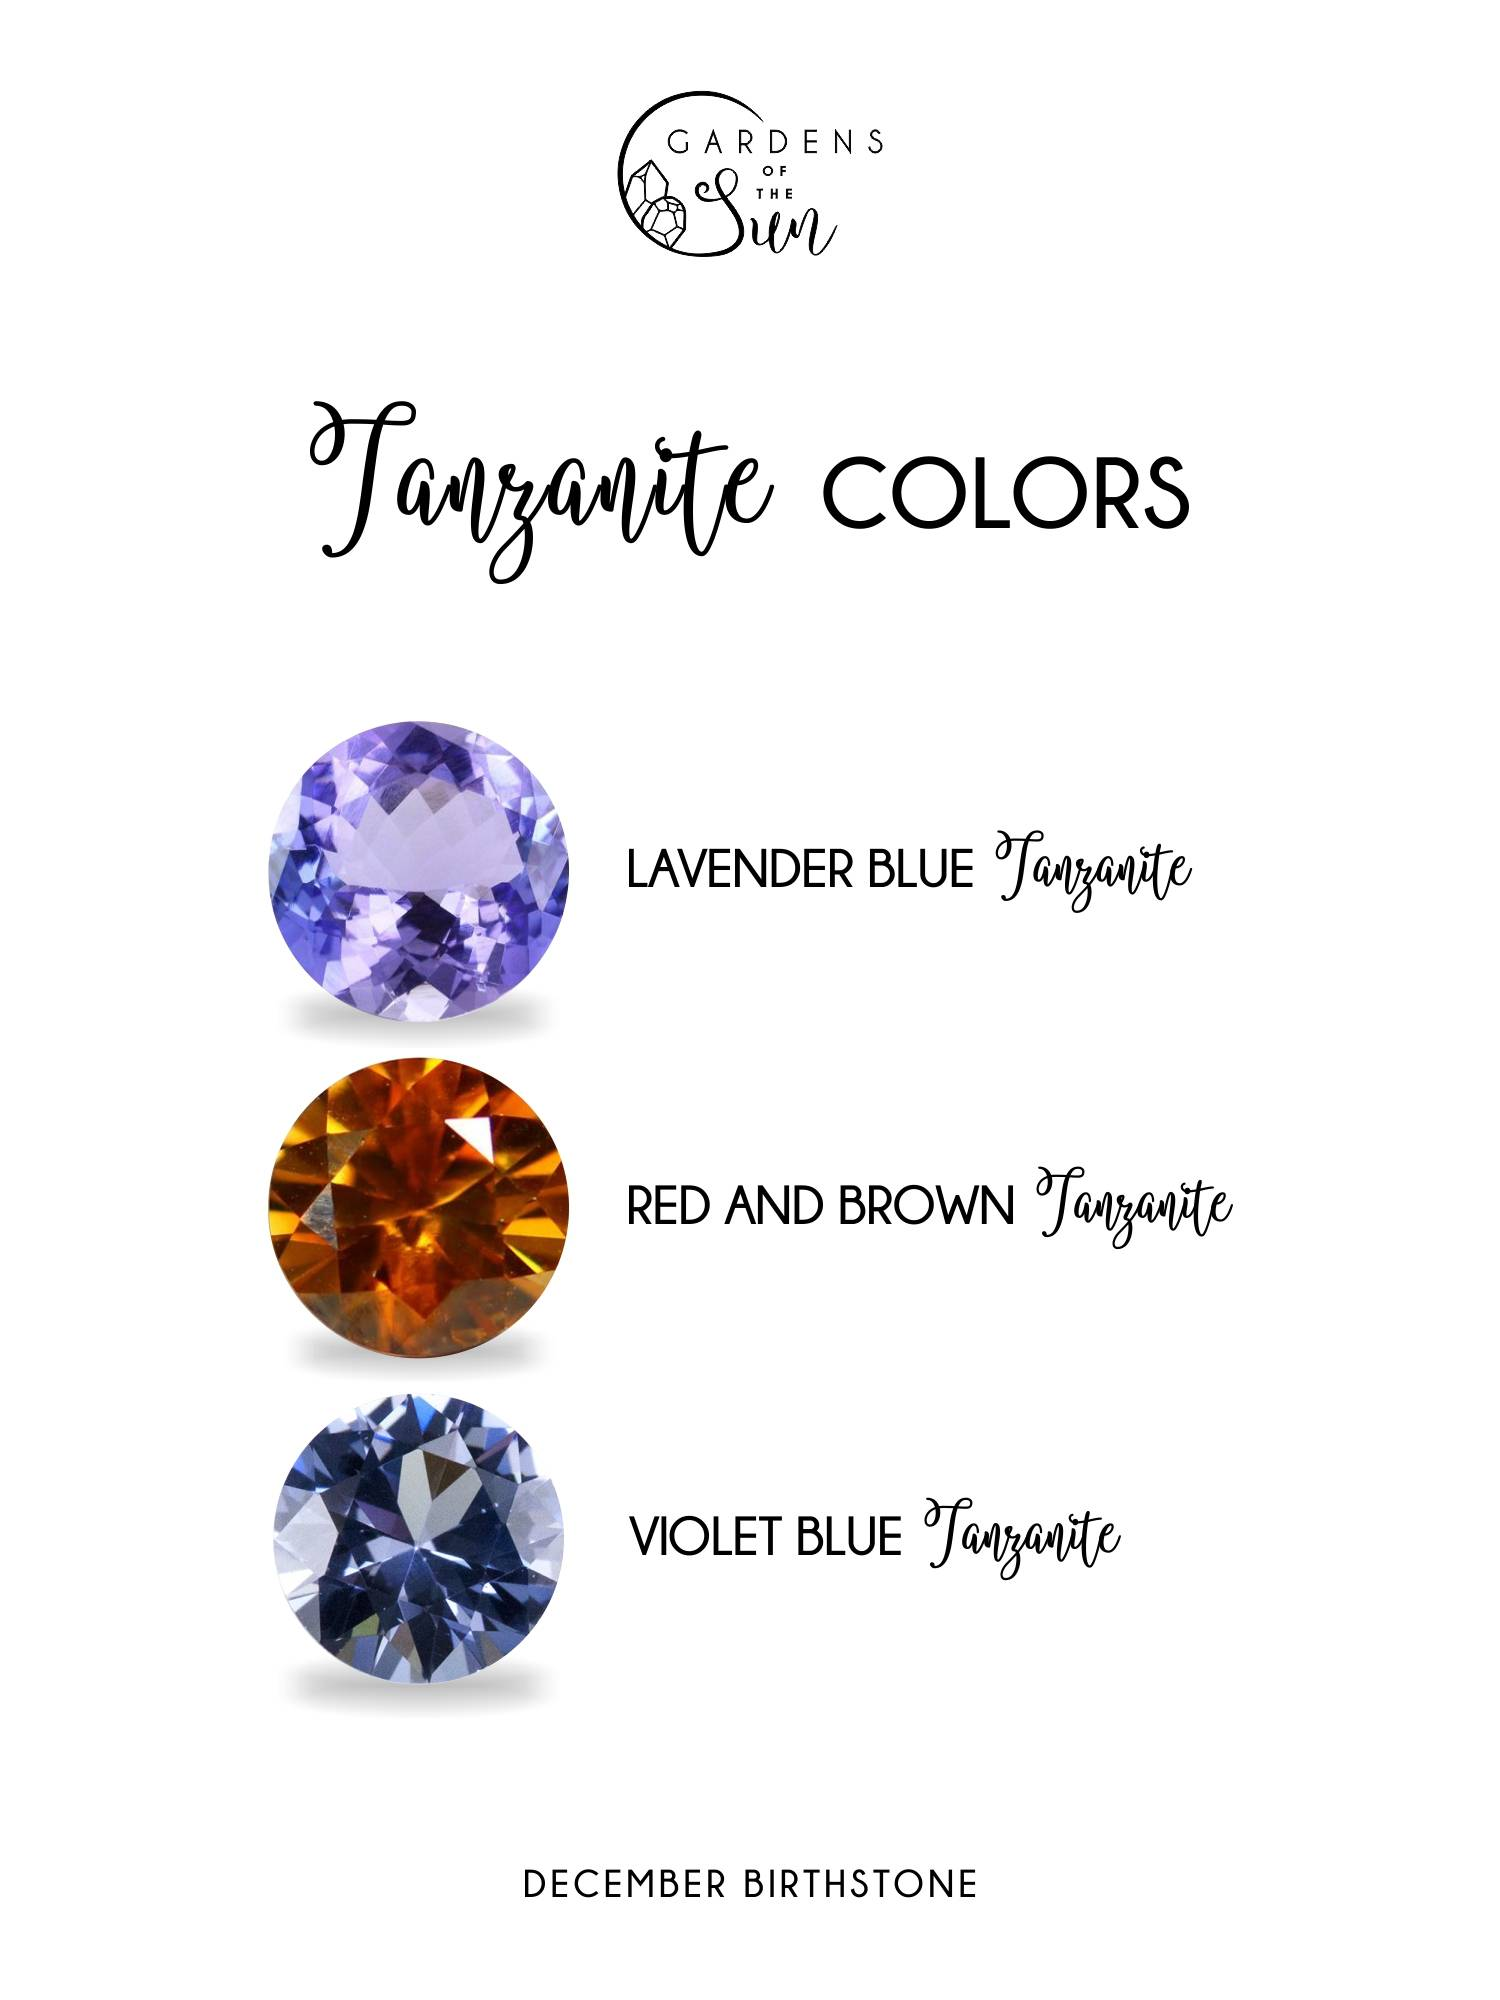 Tanzanite colors